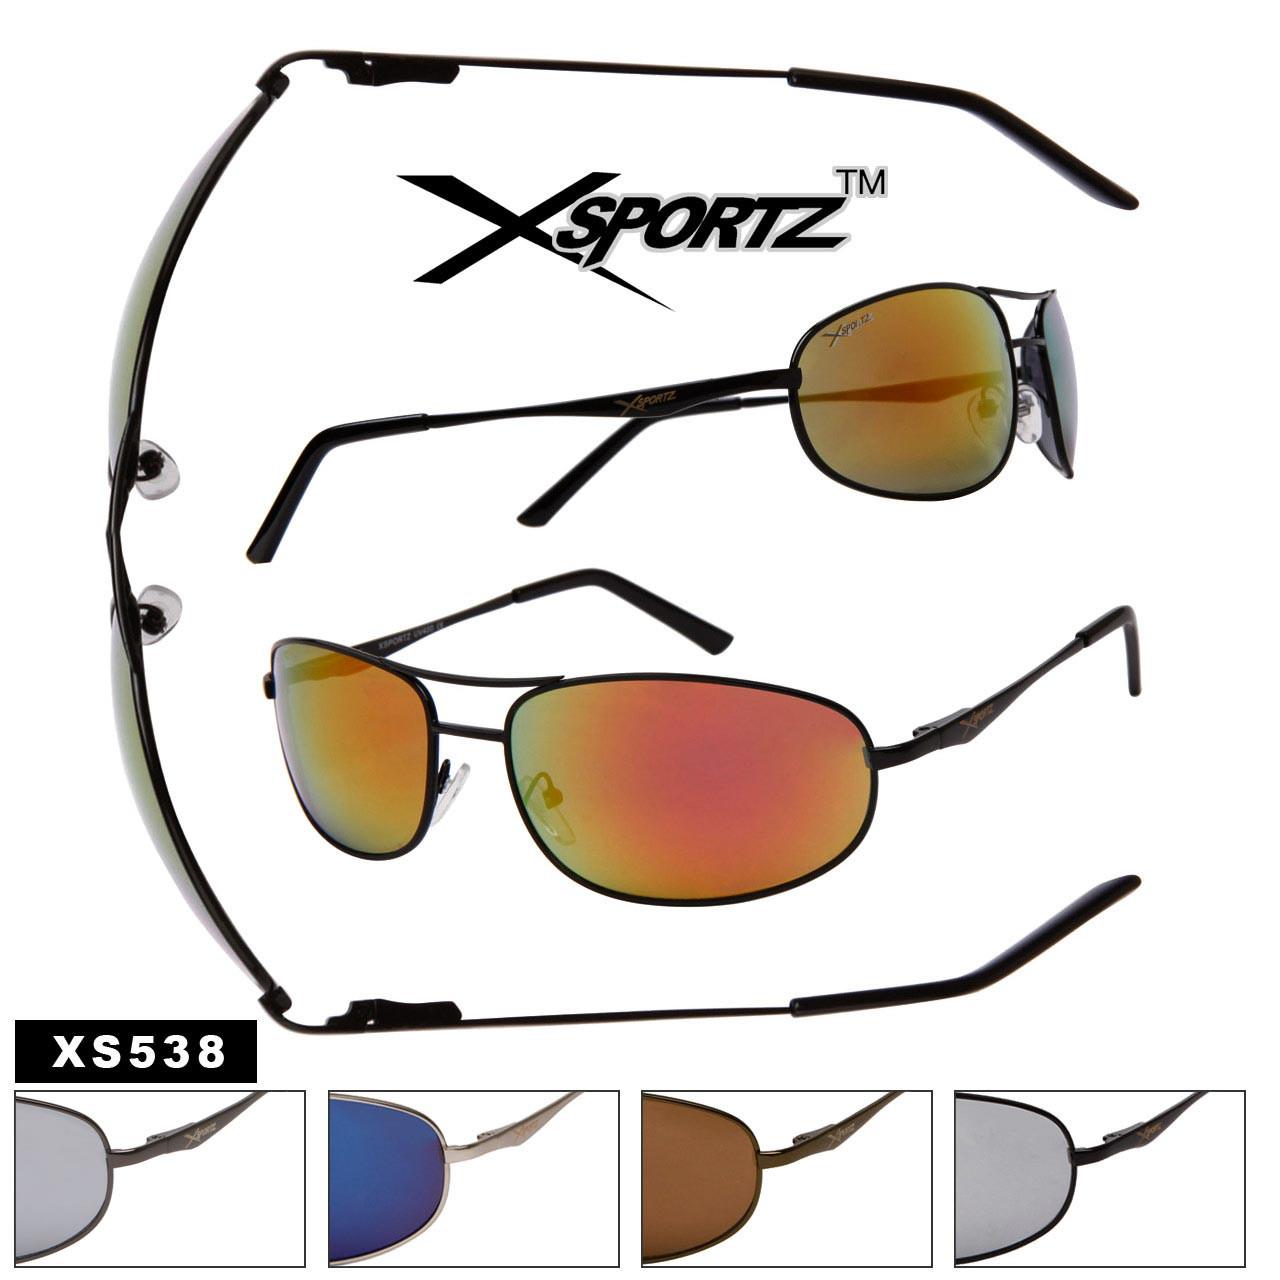 Xsportz™ Sunglasses Wholesale by the dozen XS538